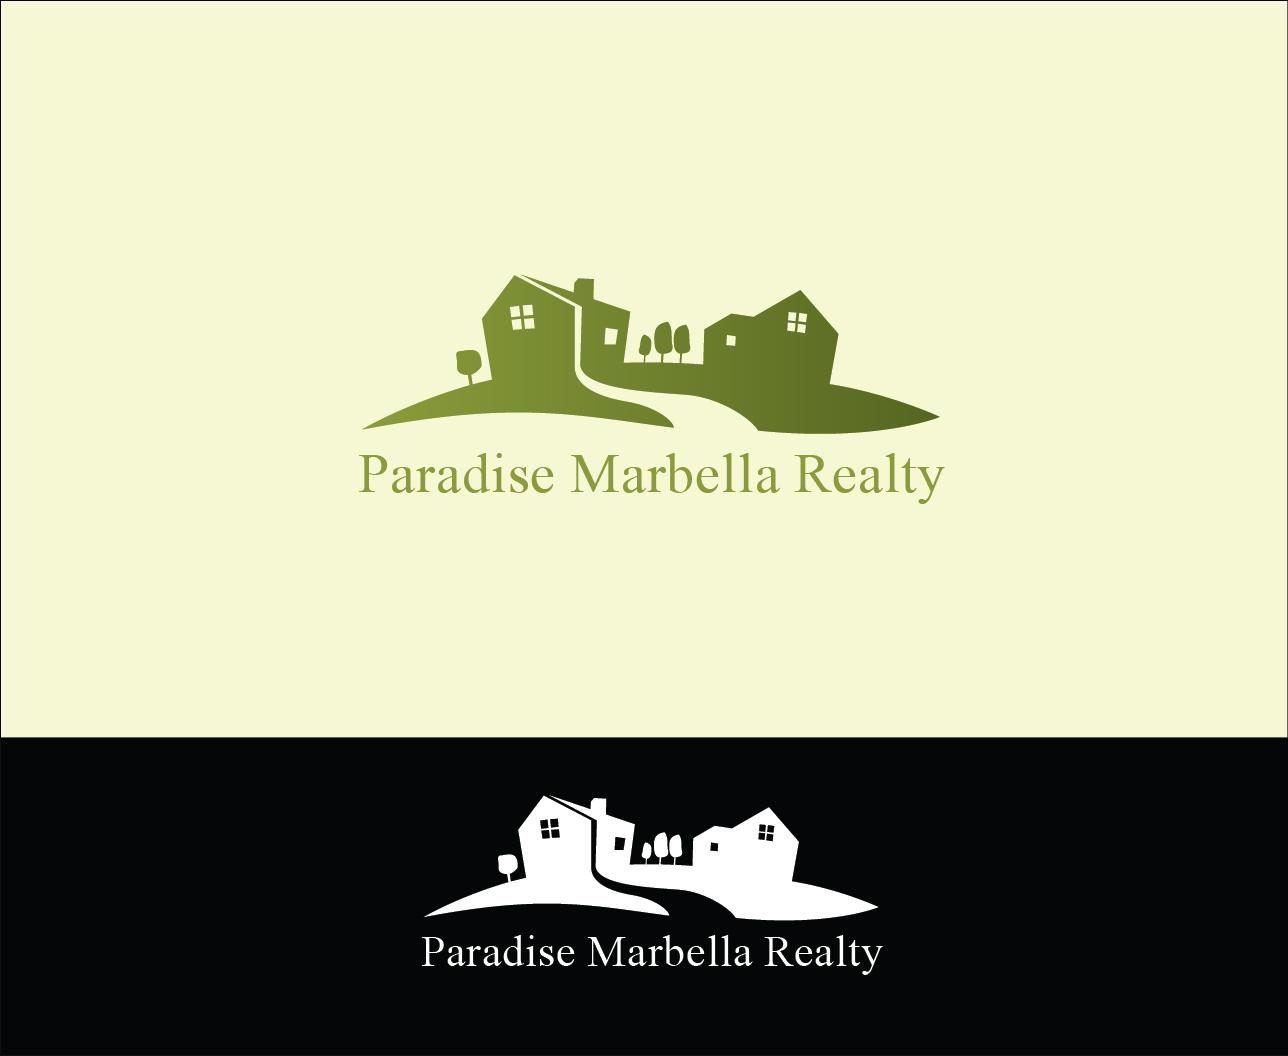 Logo Design by Derel Valarian - Entry No. 34 in the Logo Design Contest Captivating Logo Design for Paradise Marbella Realty.